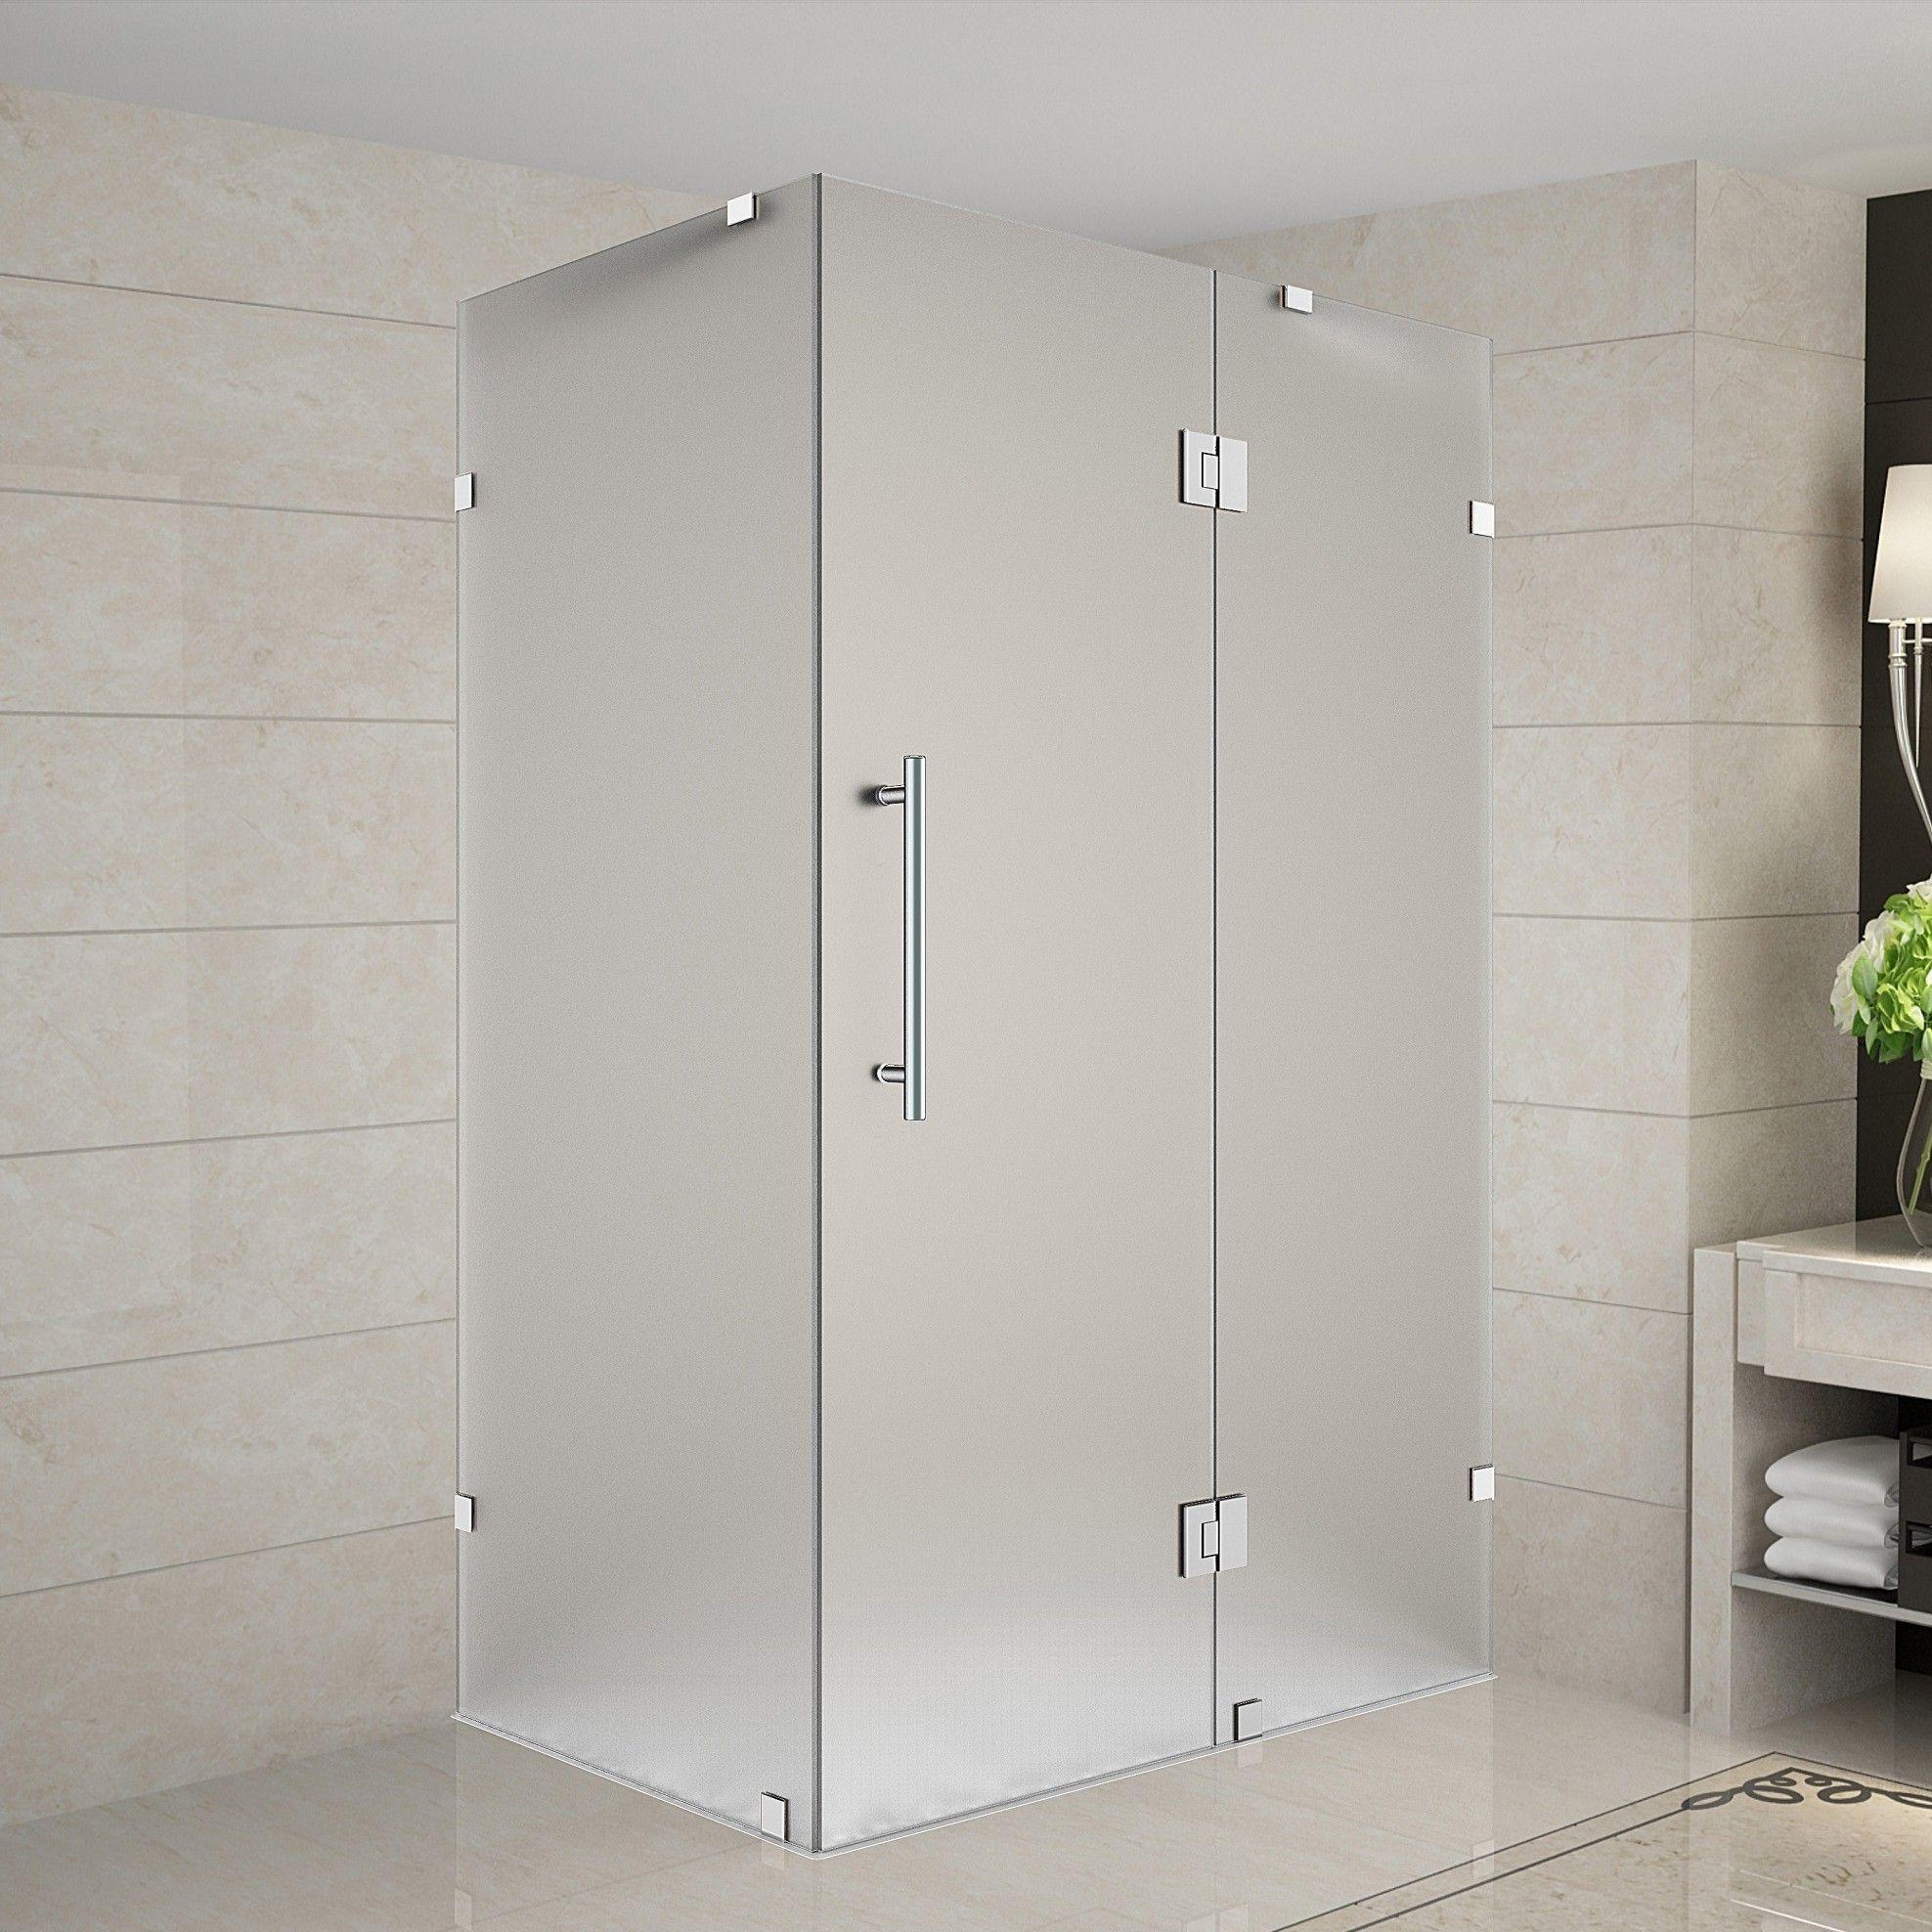 Avalux 32 X 72 Square Hinged Shower Enclosure Koupelna